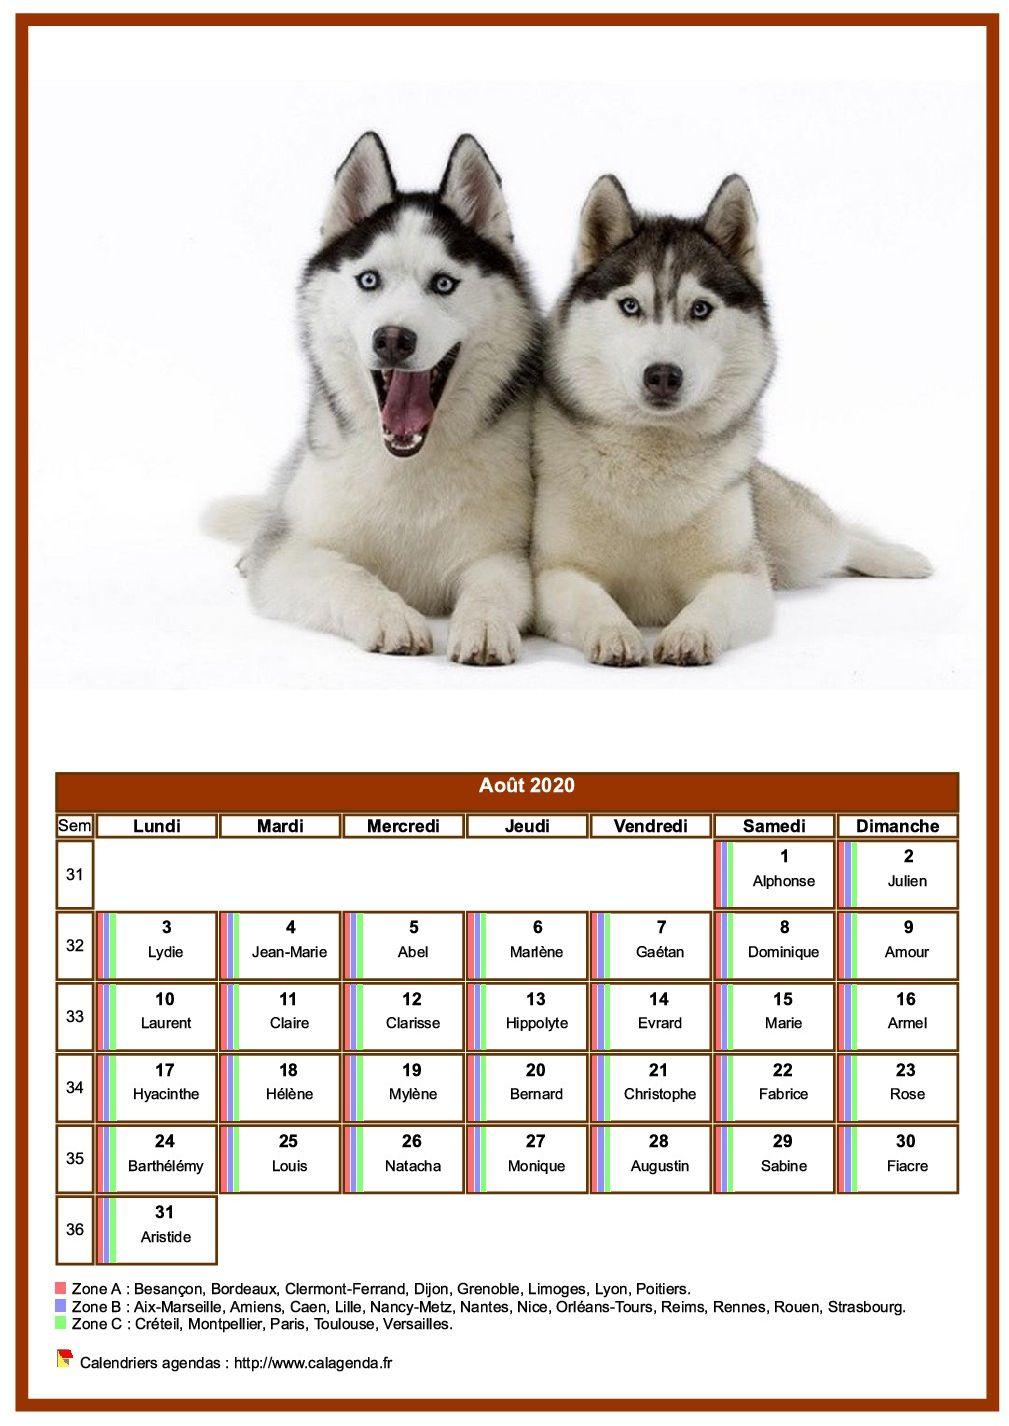 Calendrier août 2020 chiens